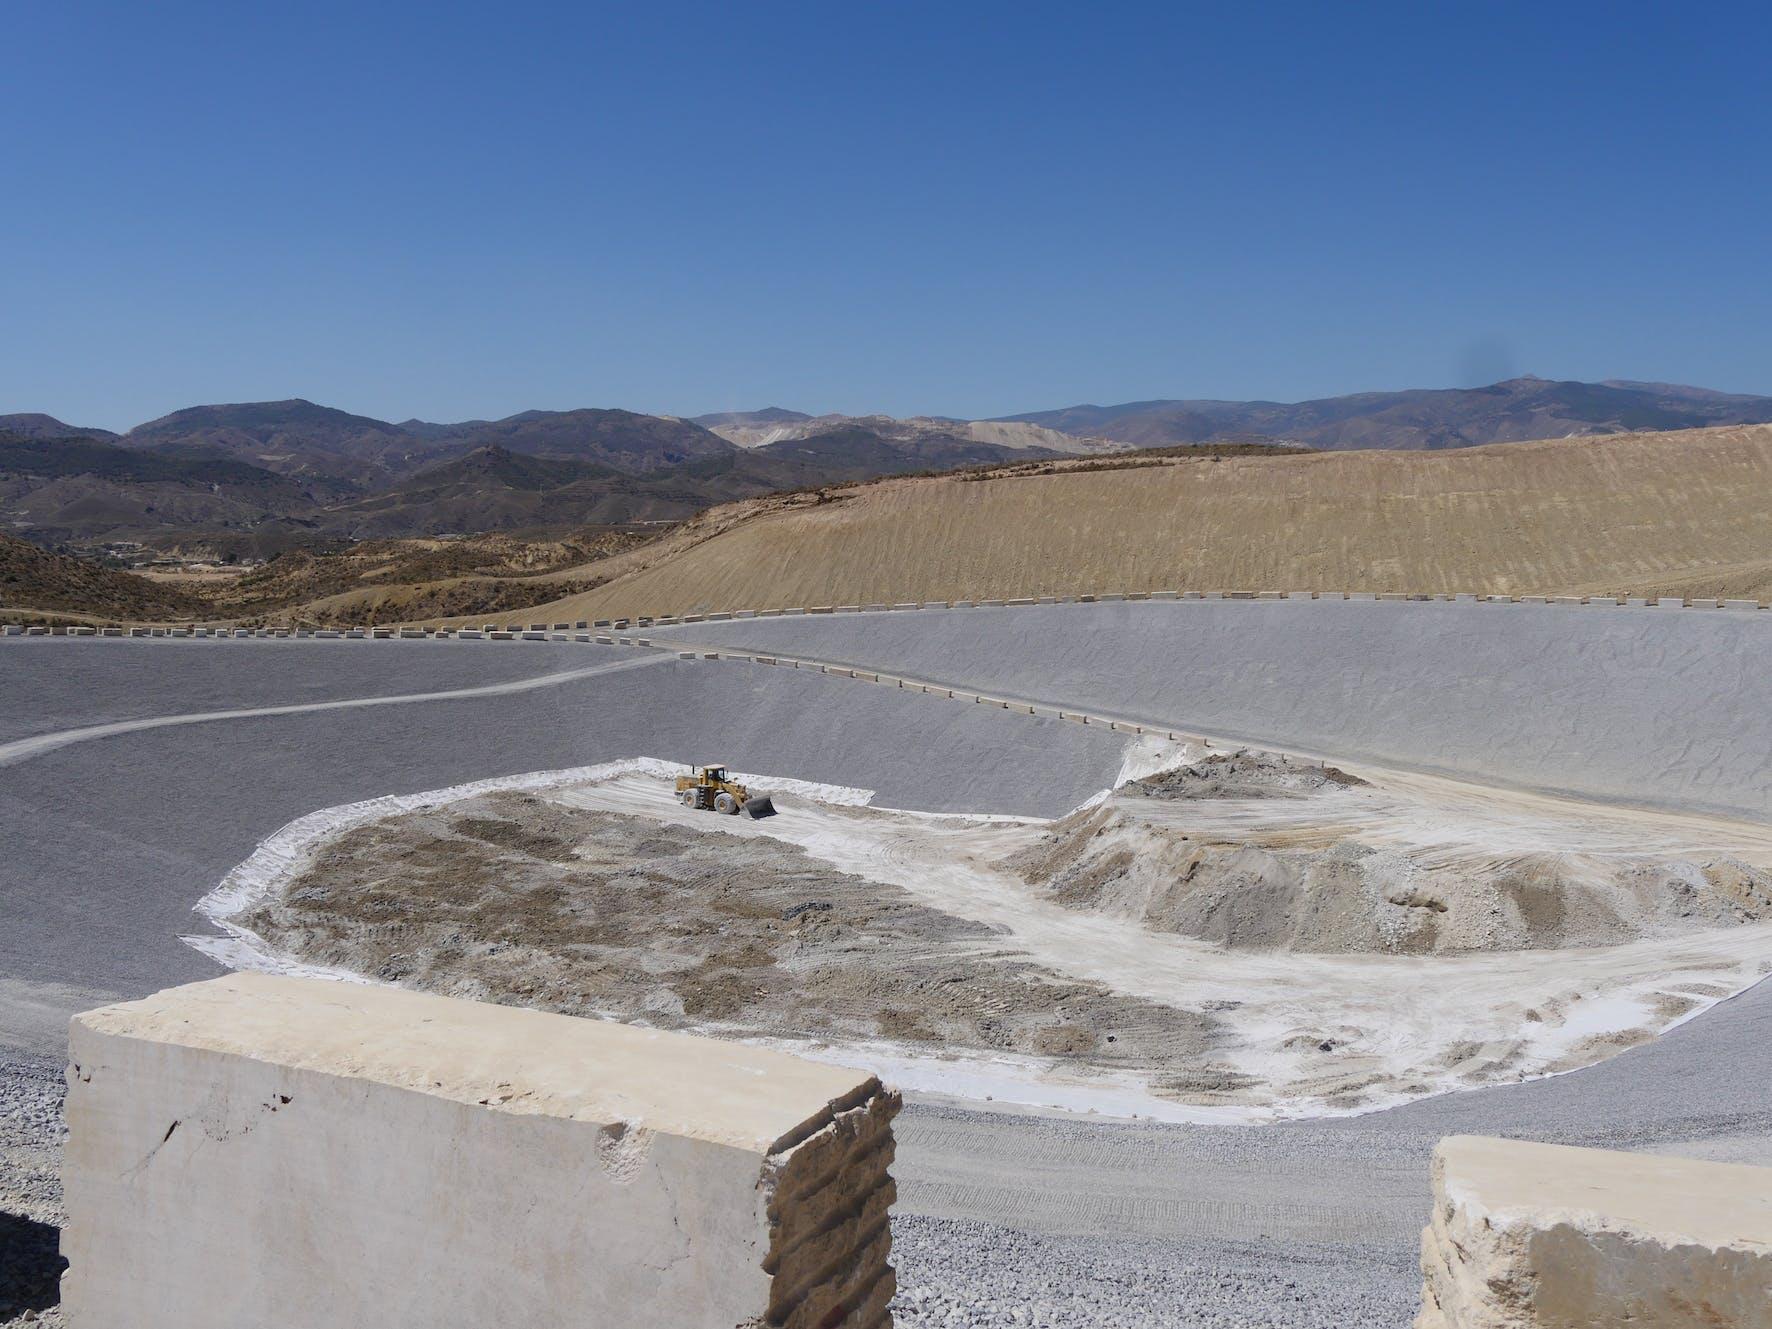 Image of vaso nopeligrosos Planta Residuos Cosentino 1 in Cosentino builds a Waste Management Facility - Cosentino